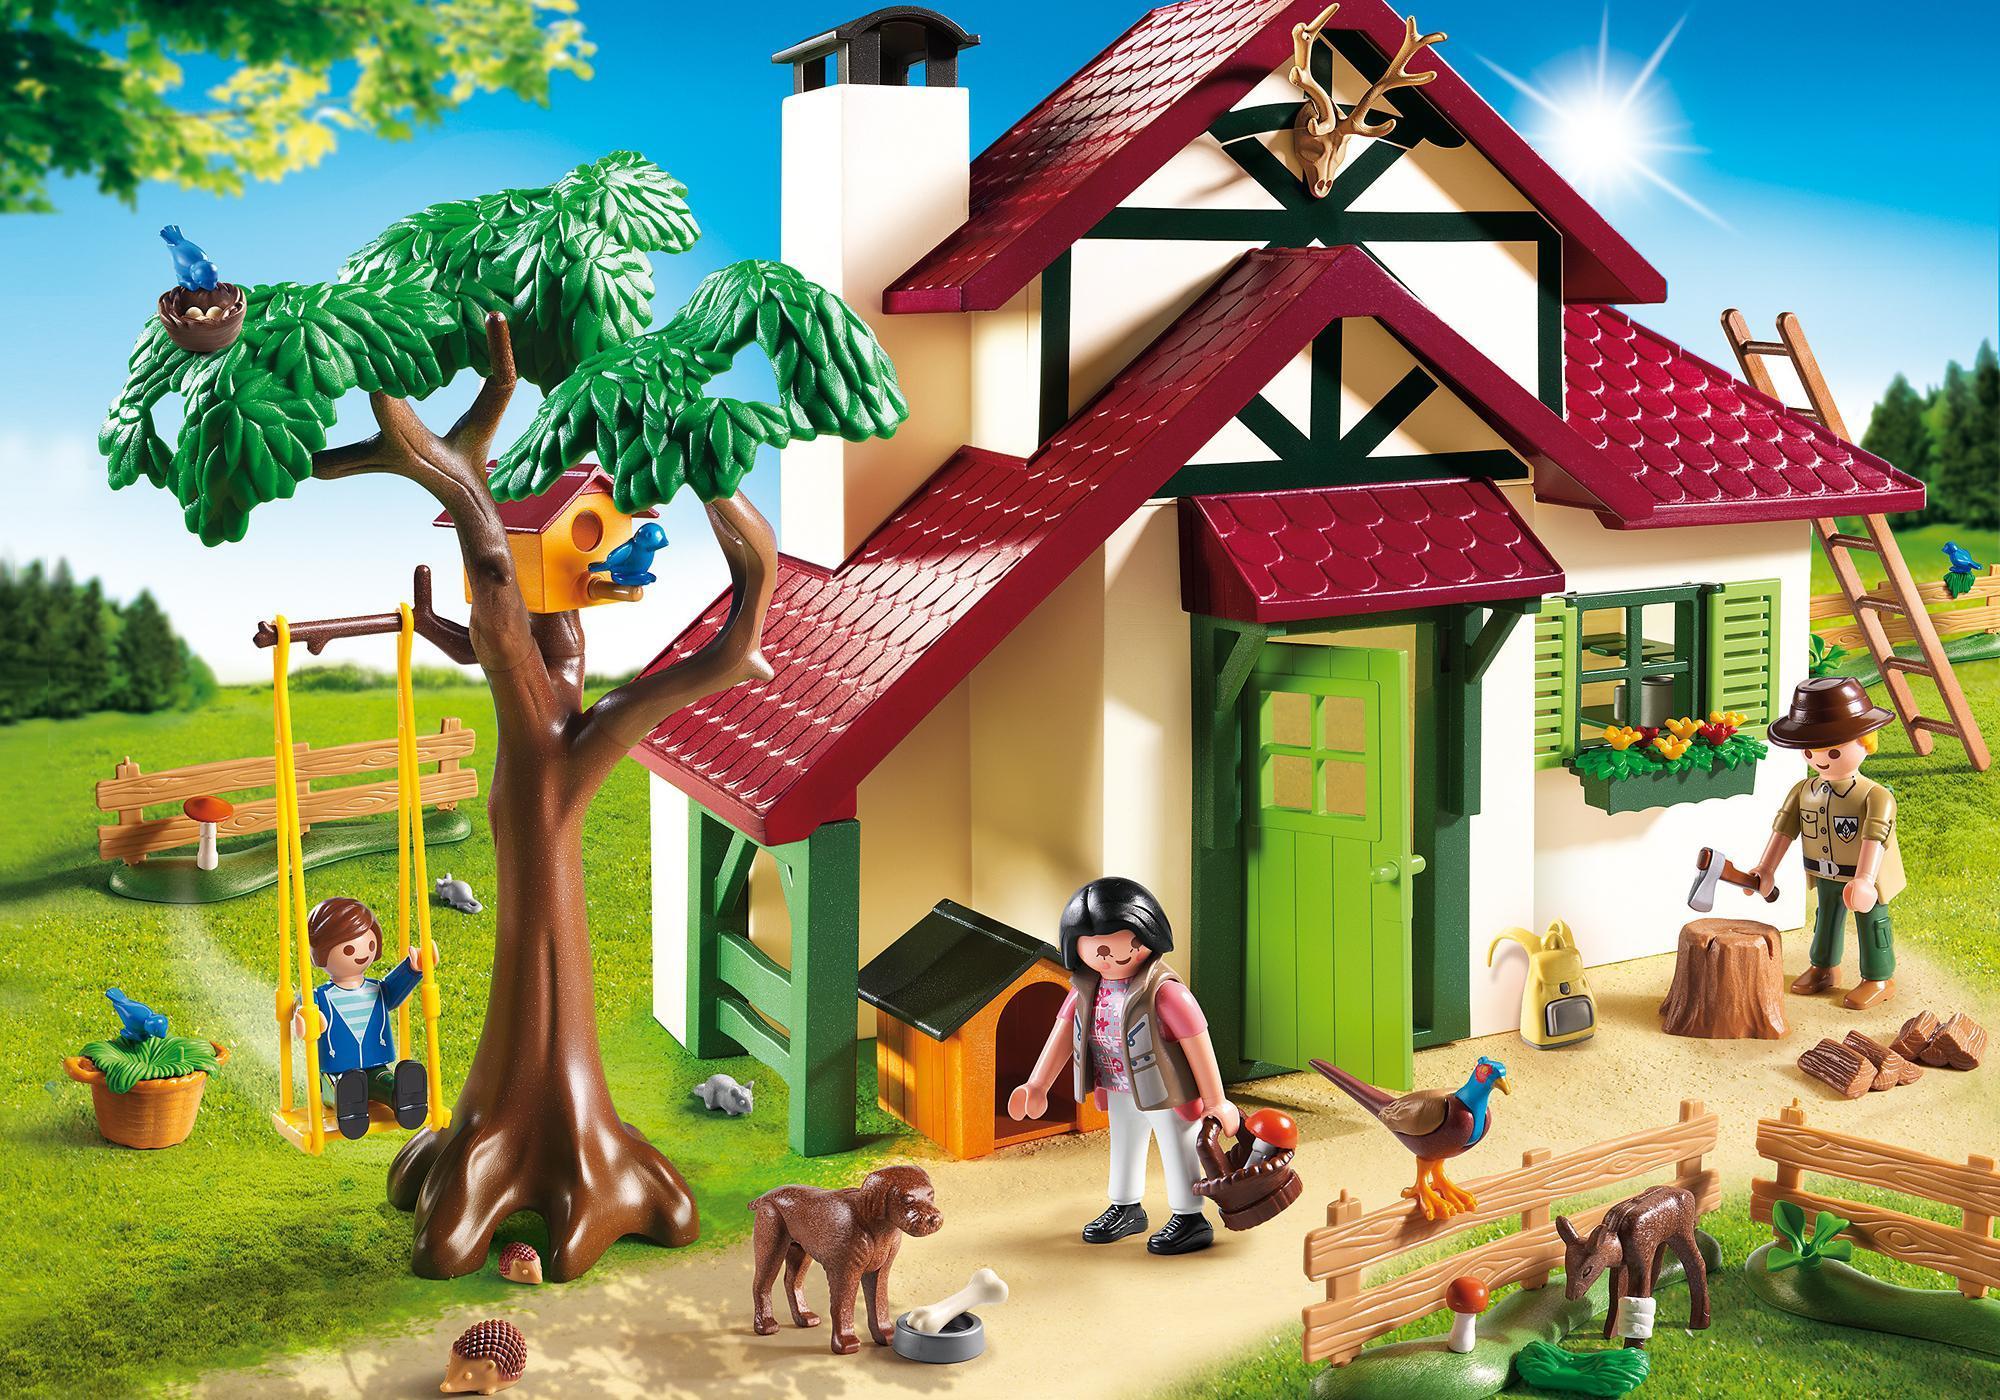 http://media.playmobil.com/i/playmobil/6811_product_detail/Forest Ranger's House